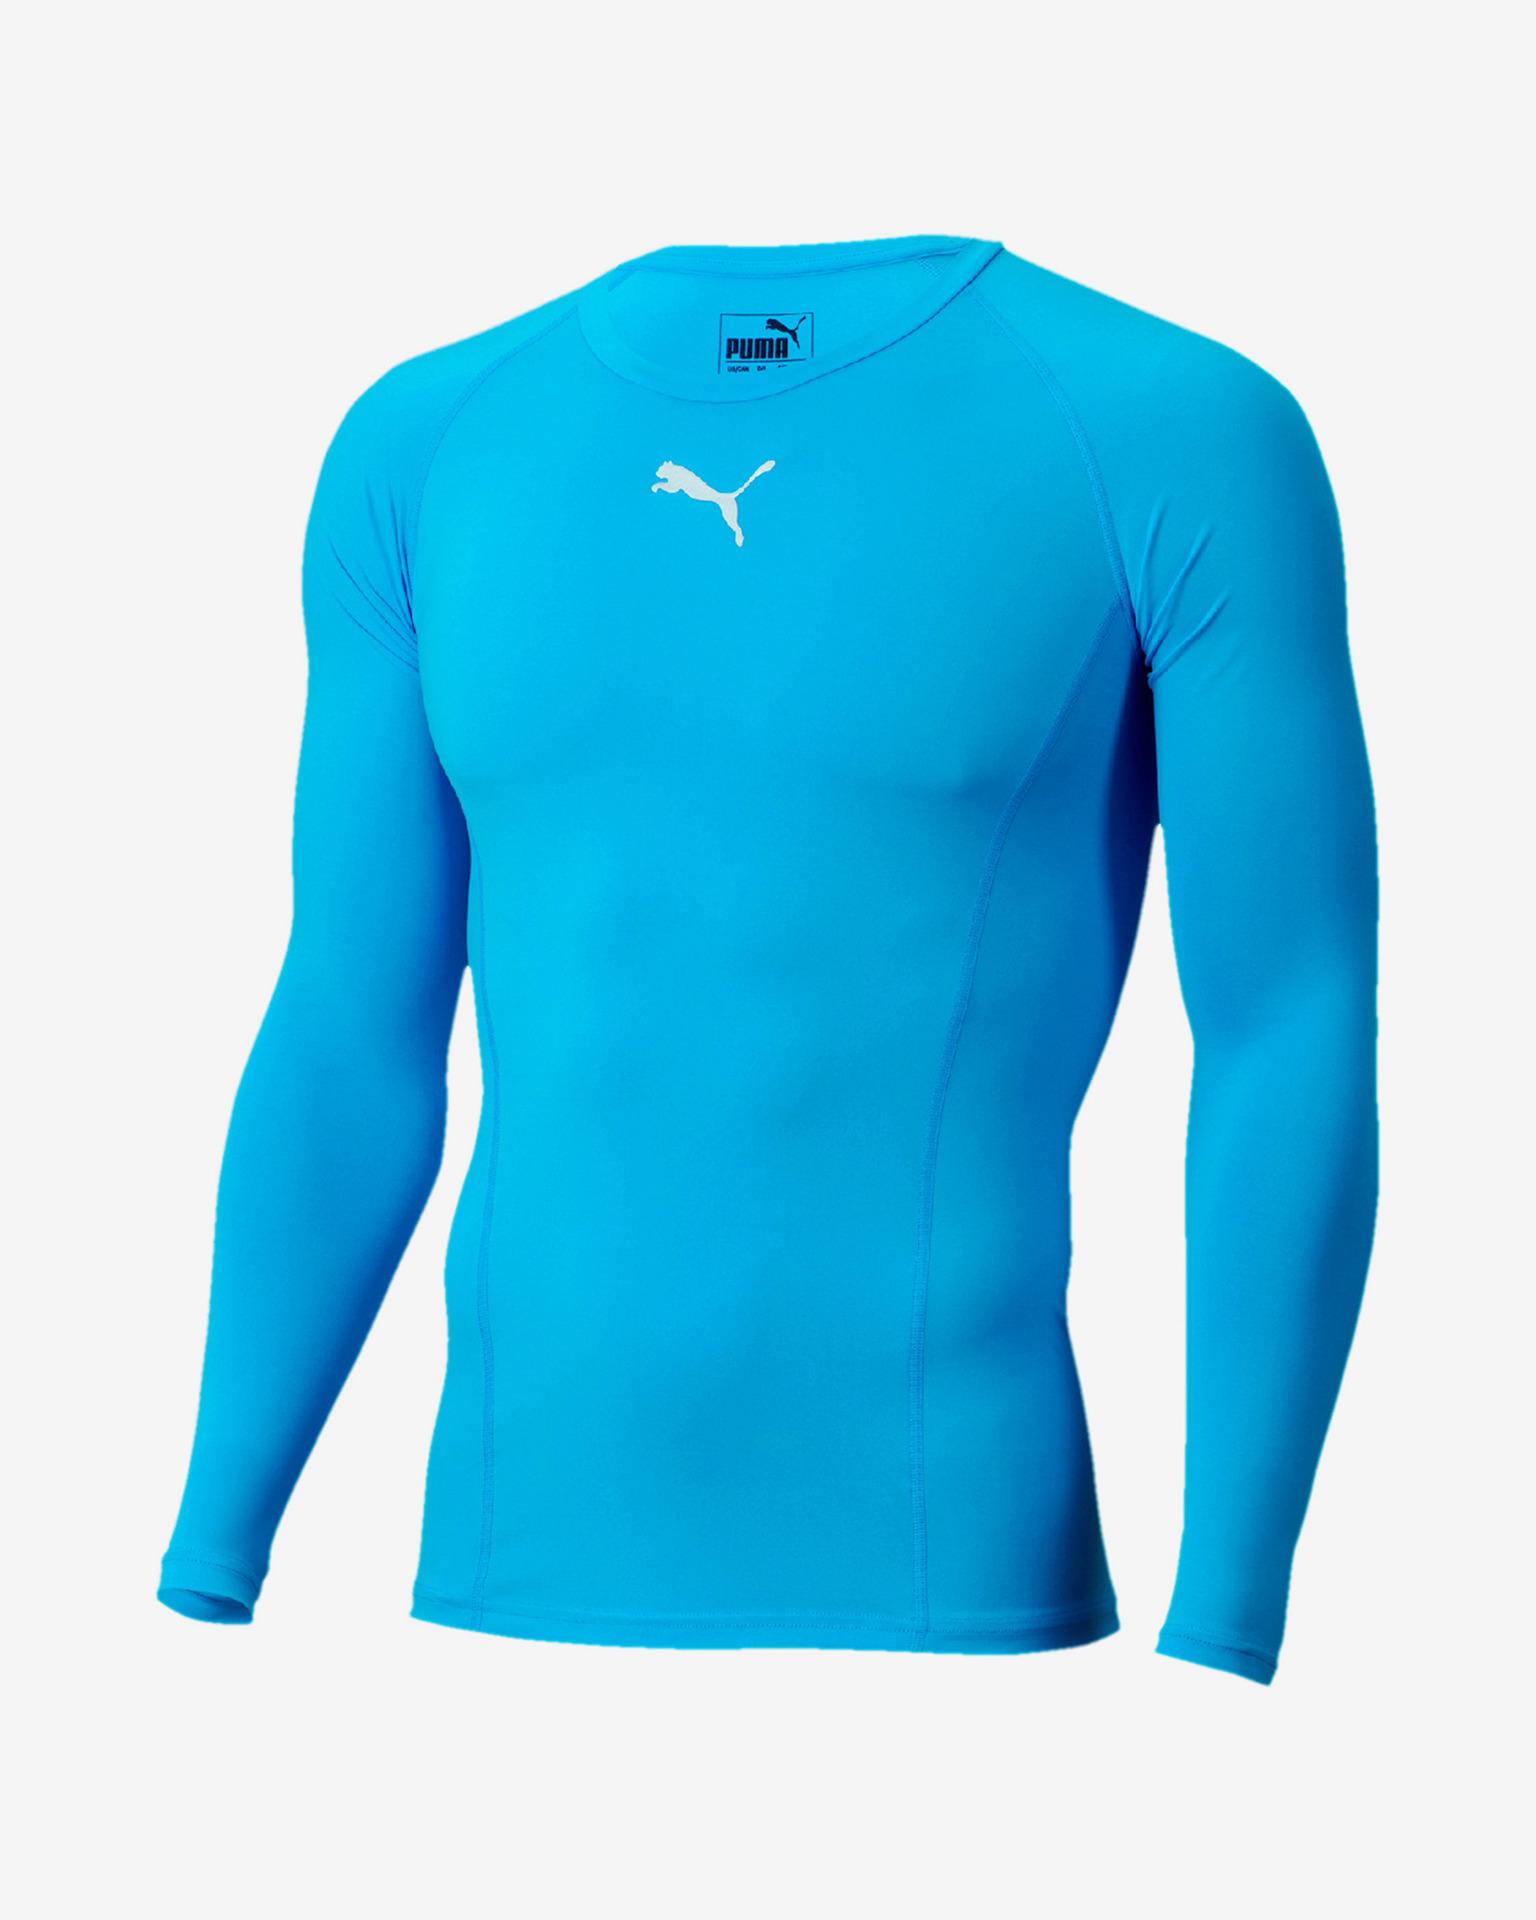 Puma - Liga Baselayer T-shirt Bibloo.com